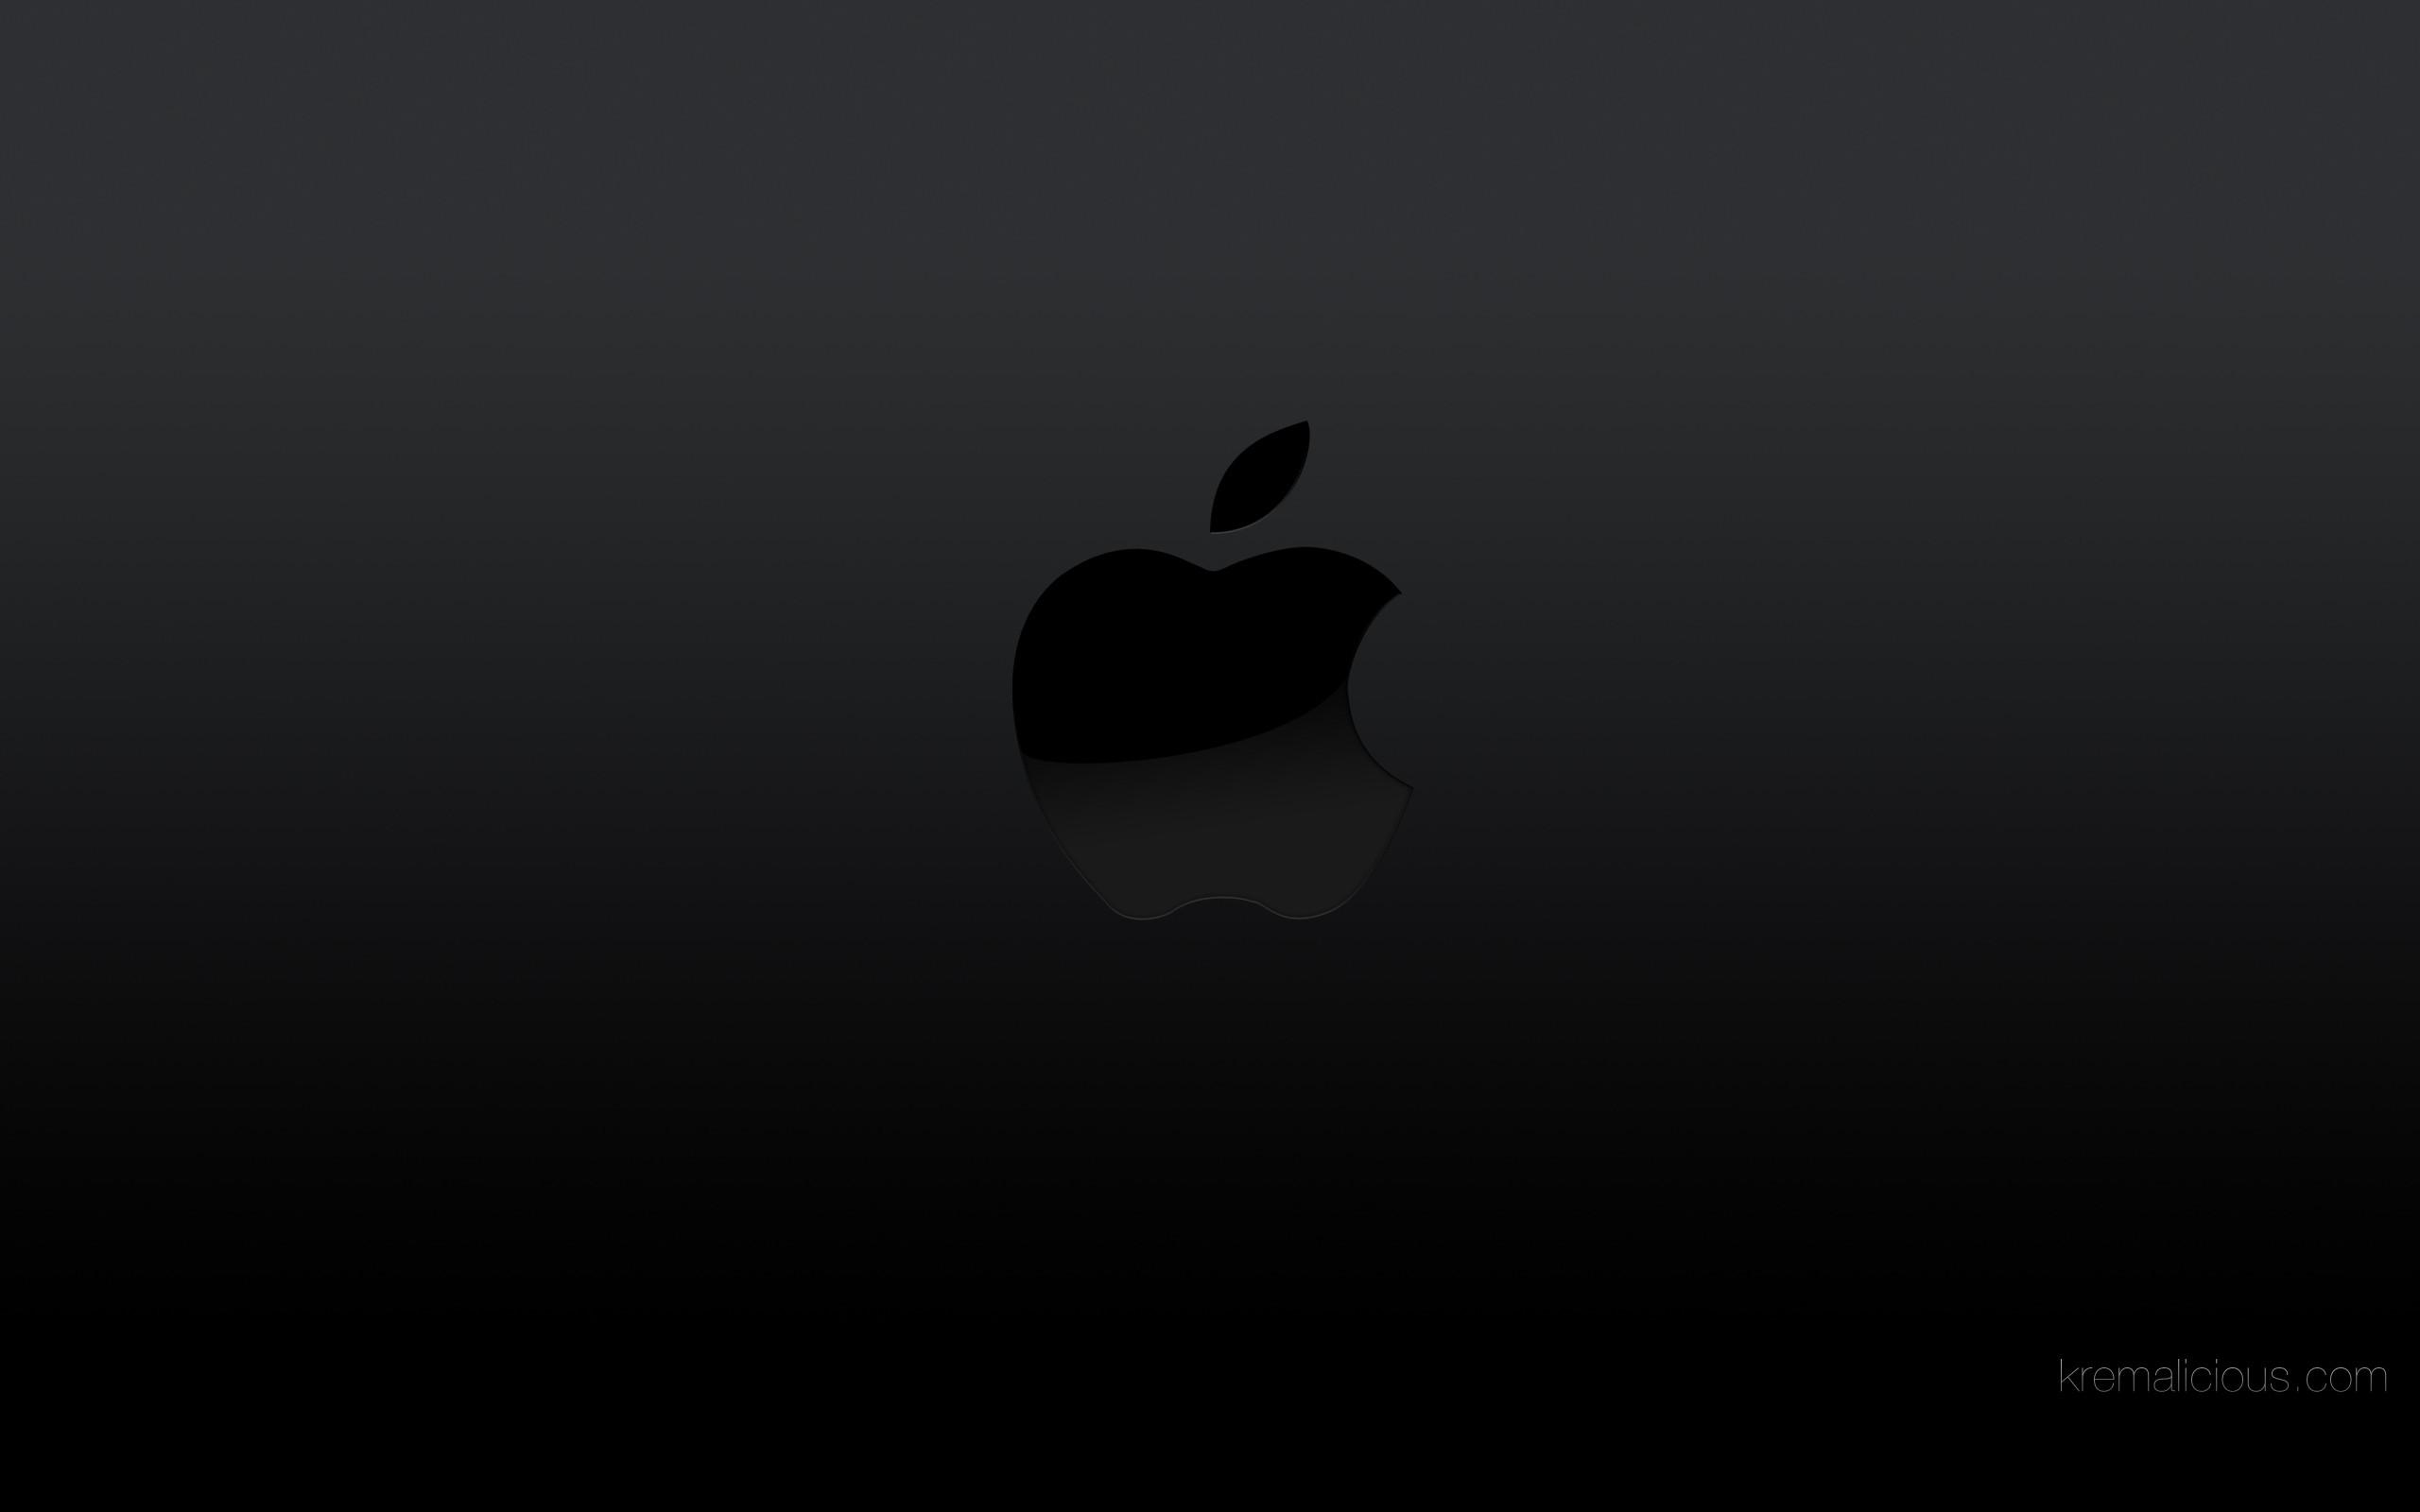 Dark Aesthetic Macbook Wallpaper